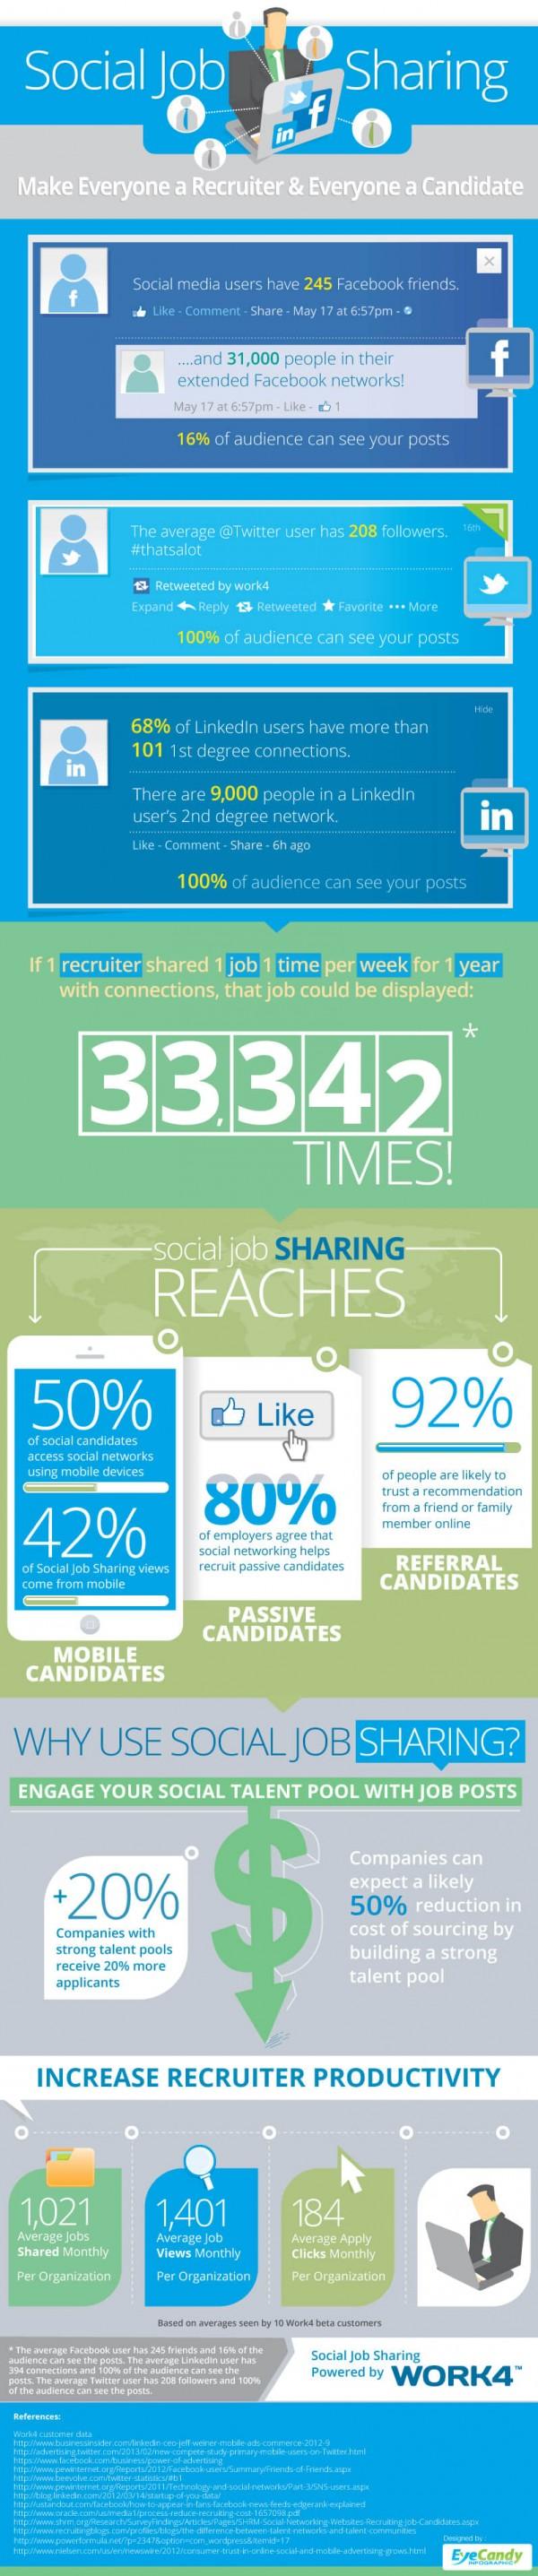 Job Posting Infographic zu Social JobSharing